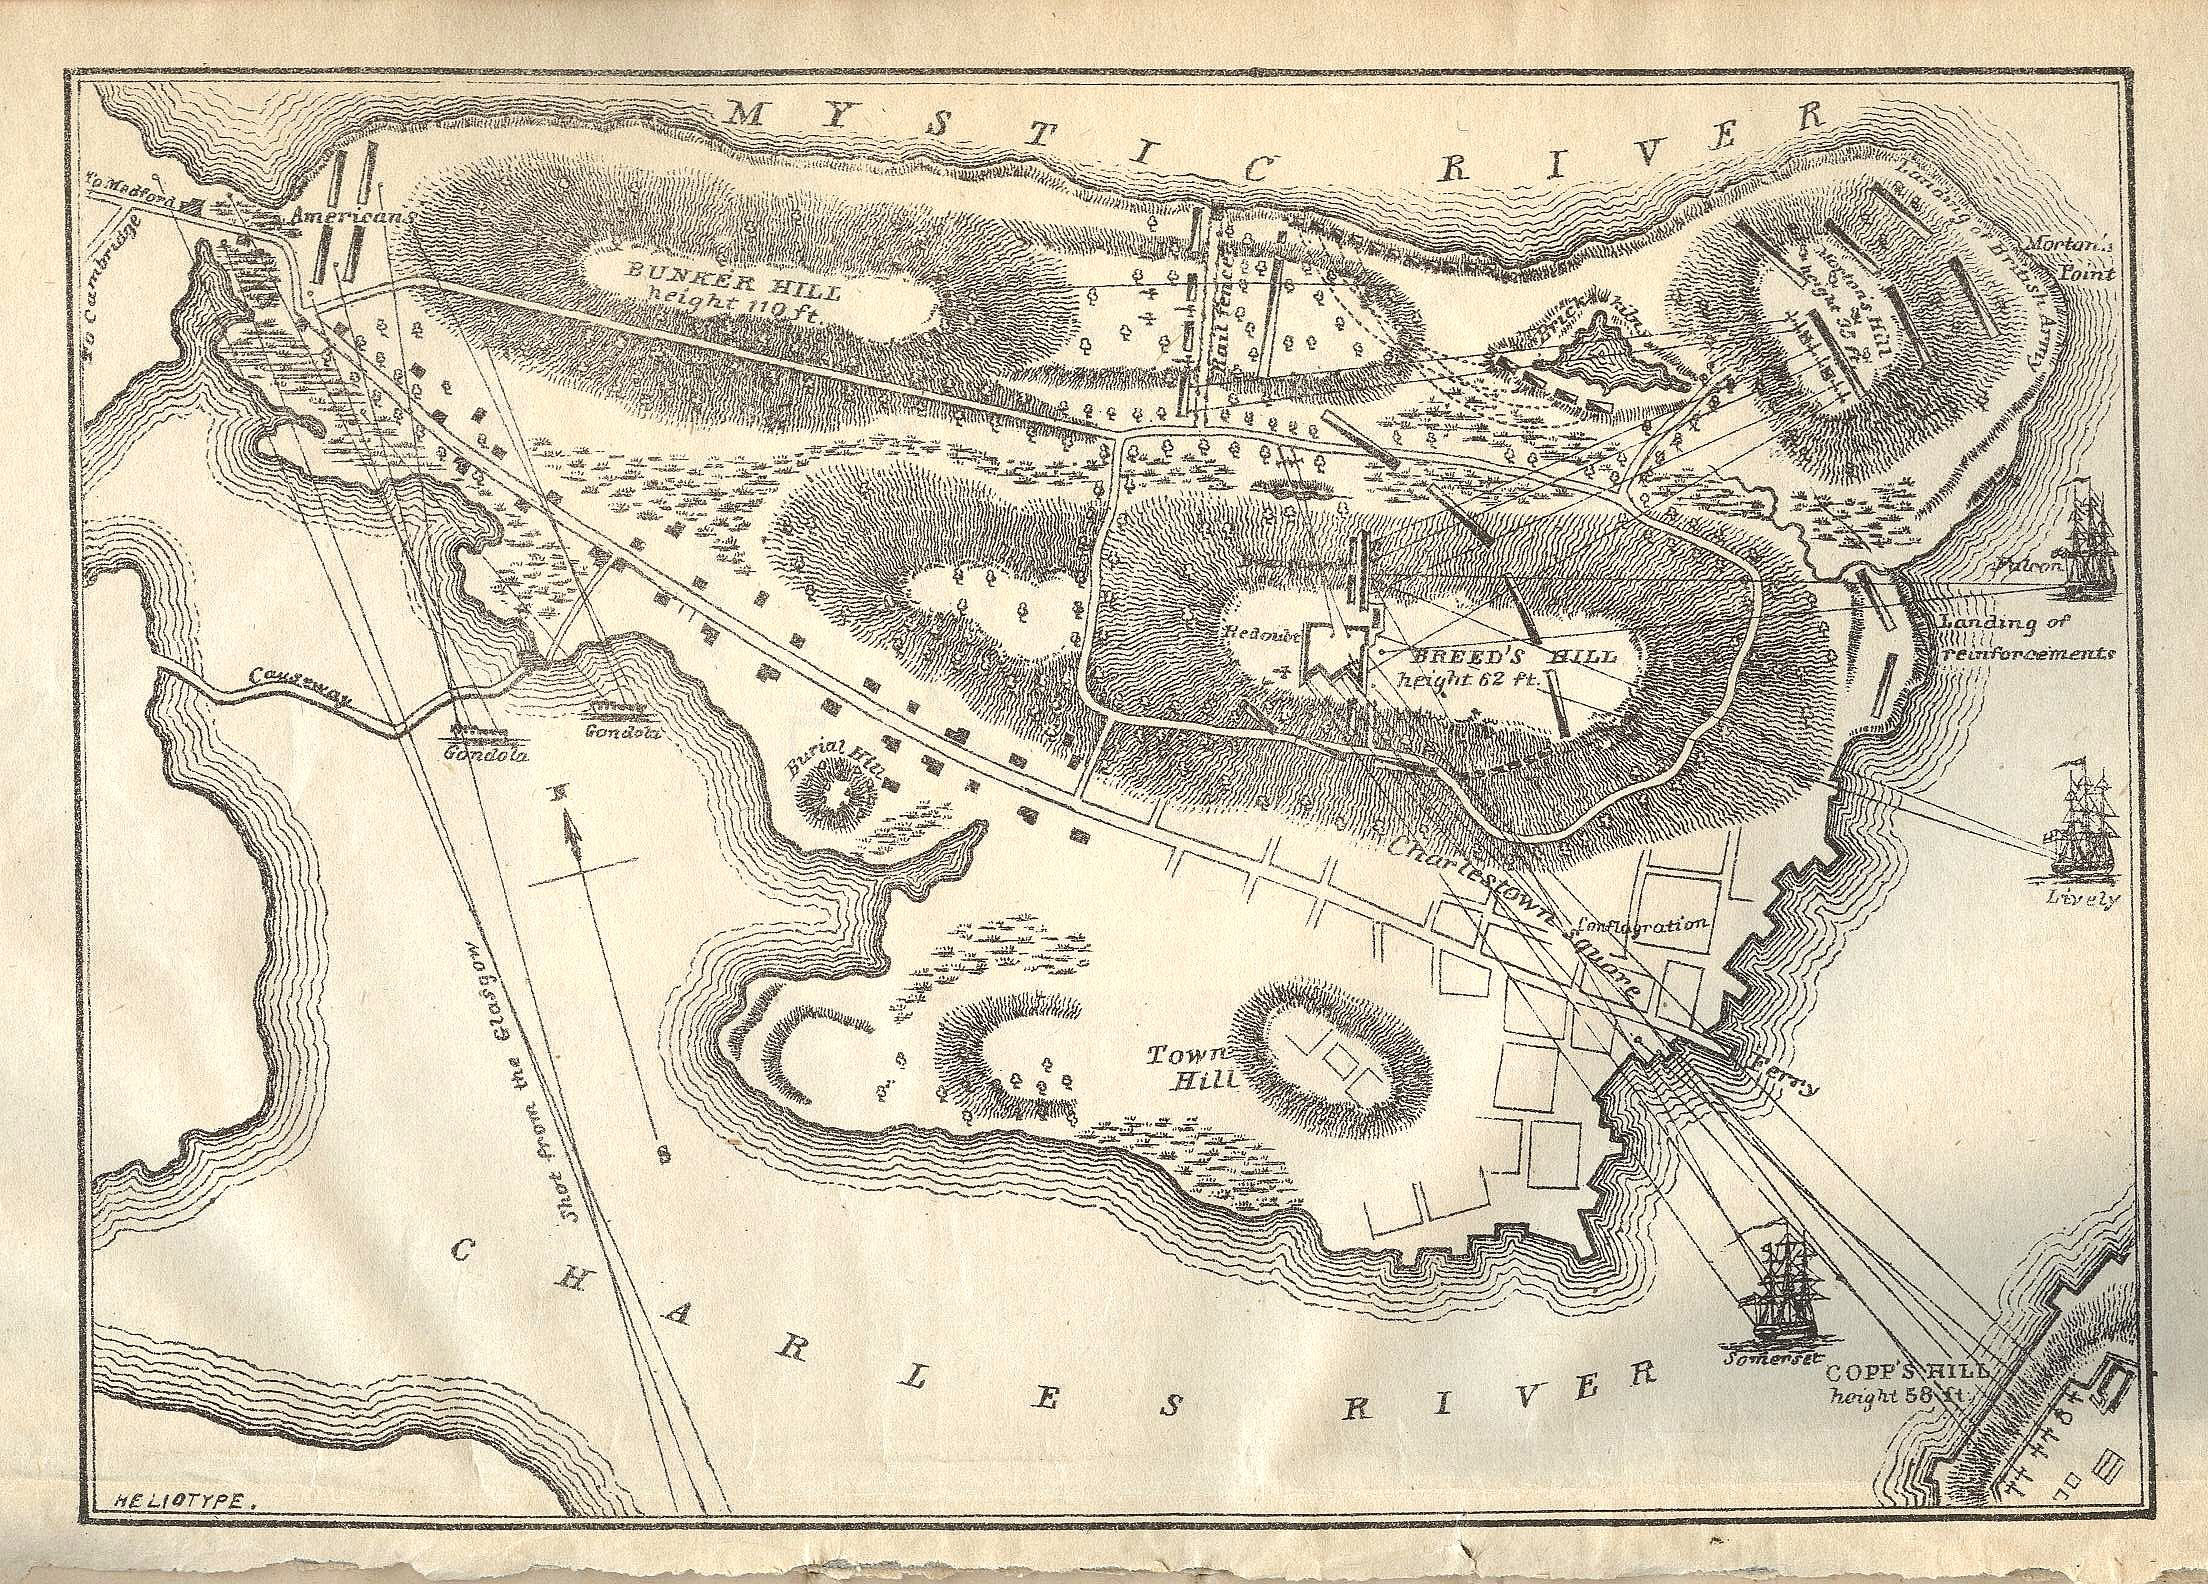 Карта полуострова Чарльстон с холмами Бридс-Хилл и Банкер-Хилл